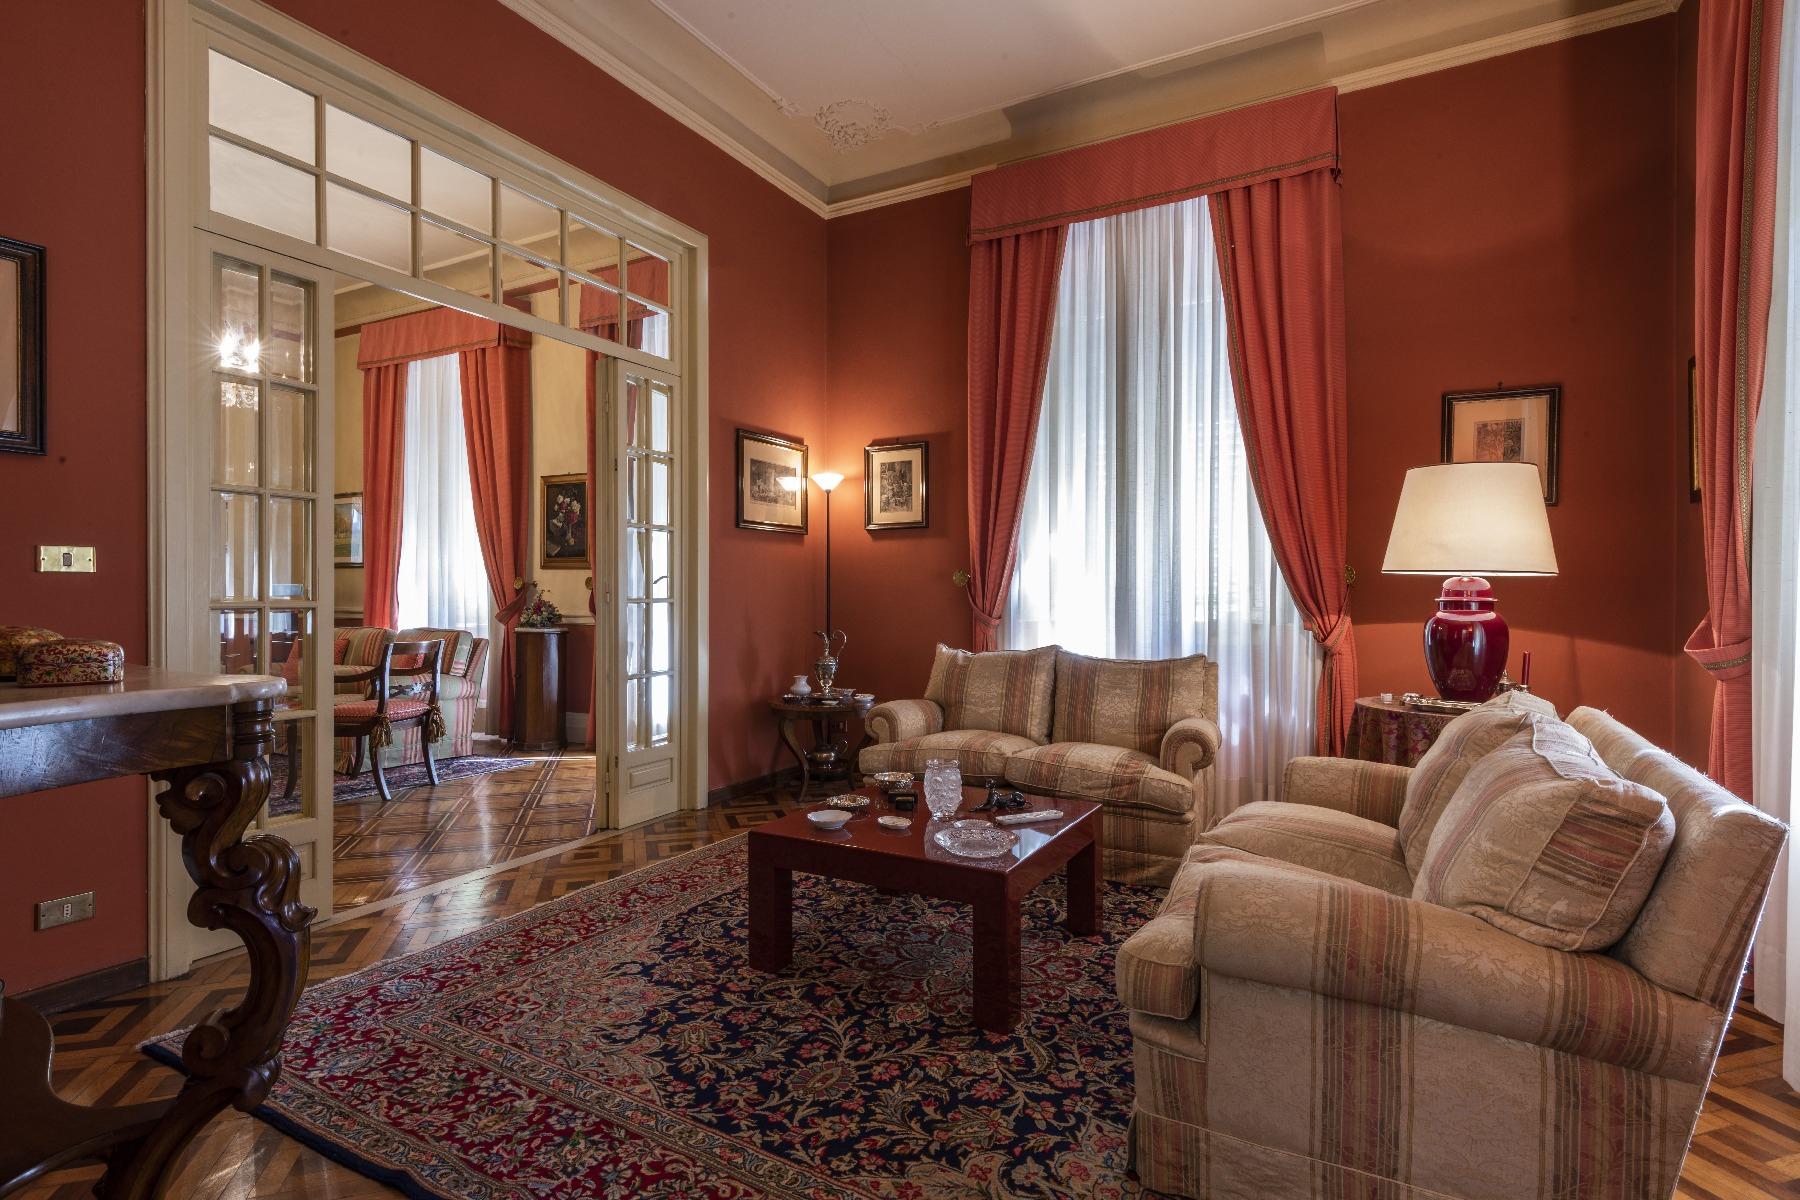 Villa in Vendita a Lucca: 5 locali, 660 mq - Foto 4